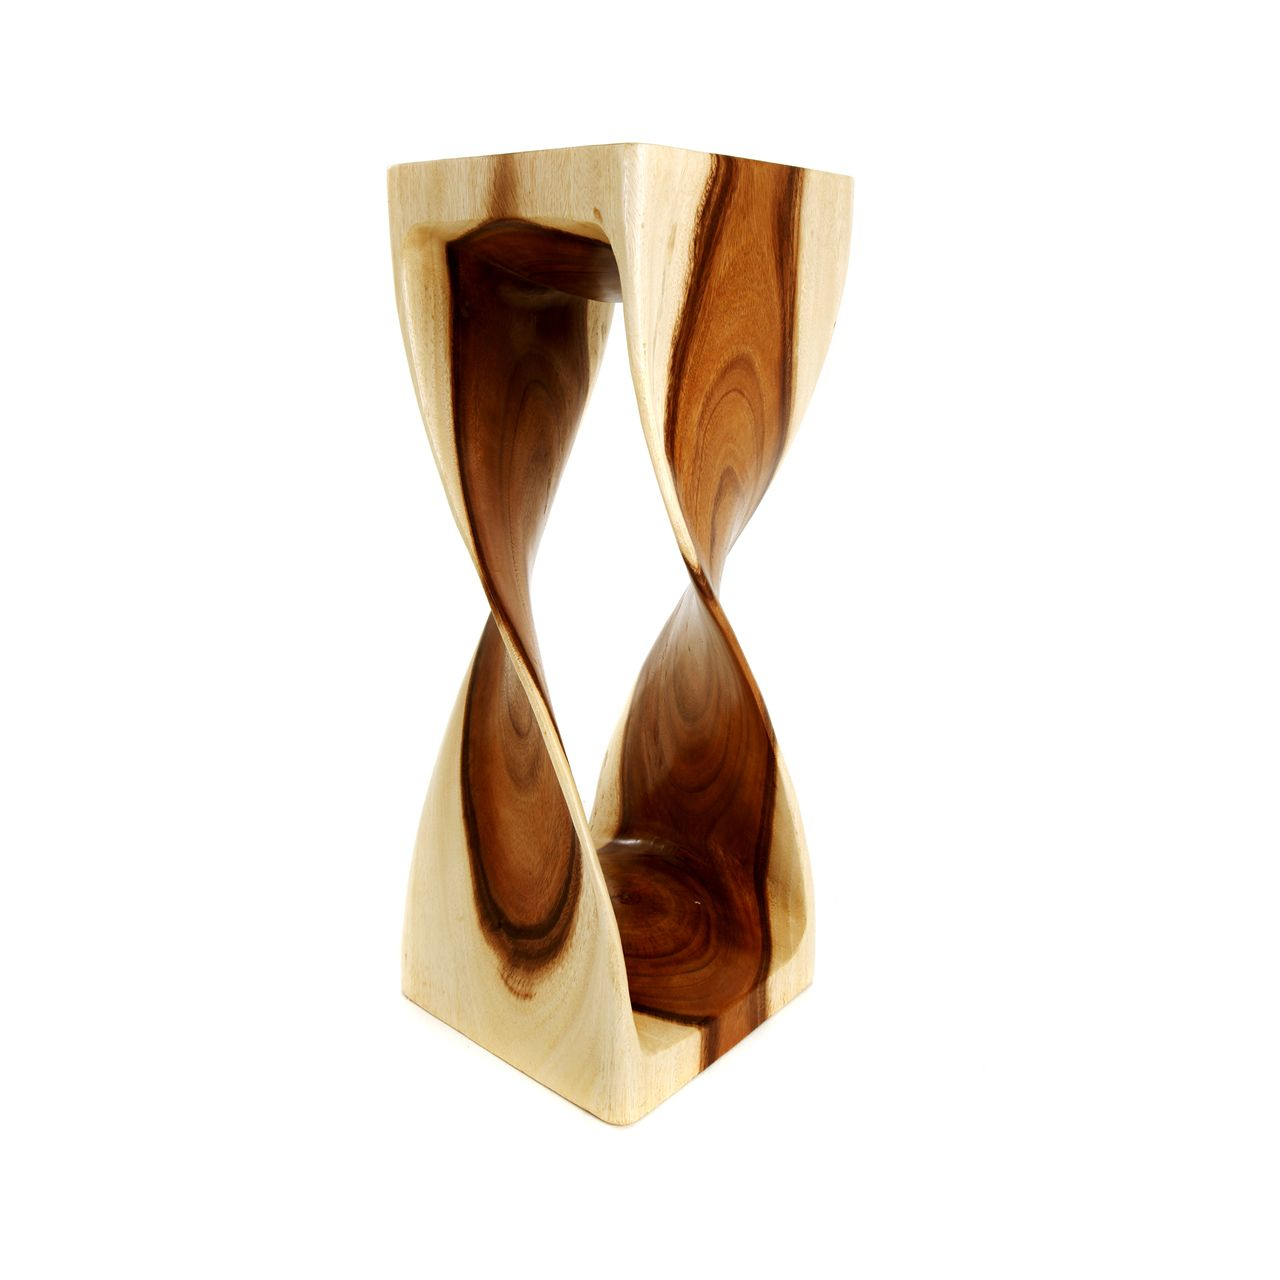 Double Twist Stool - Natural Finish - 30cm x 30cm x 76cm